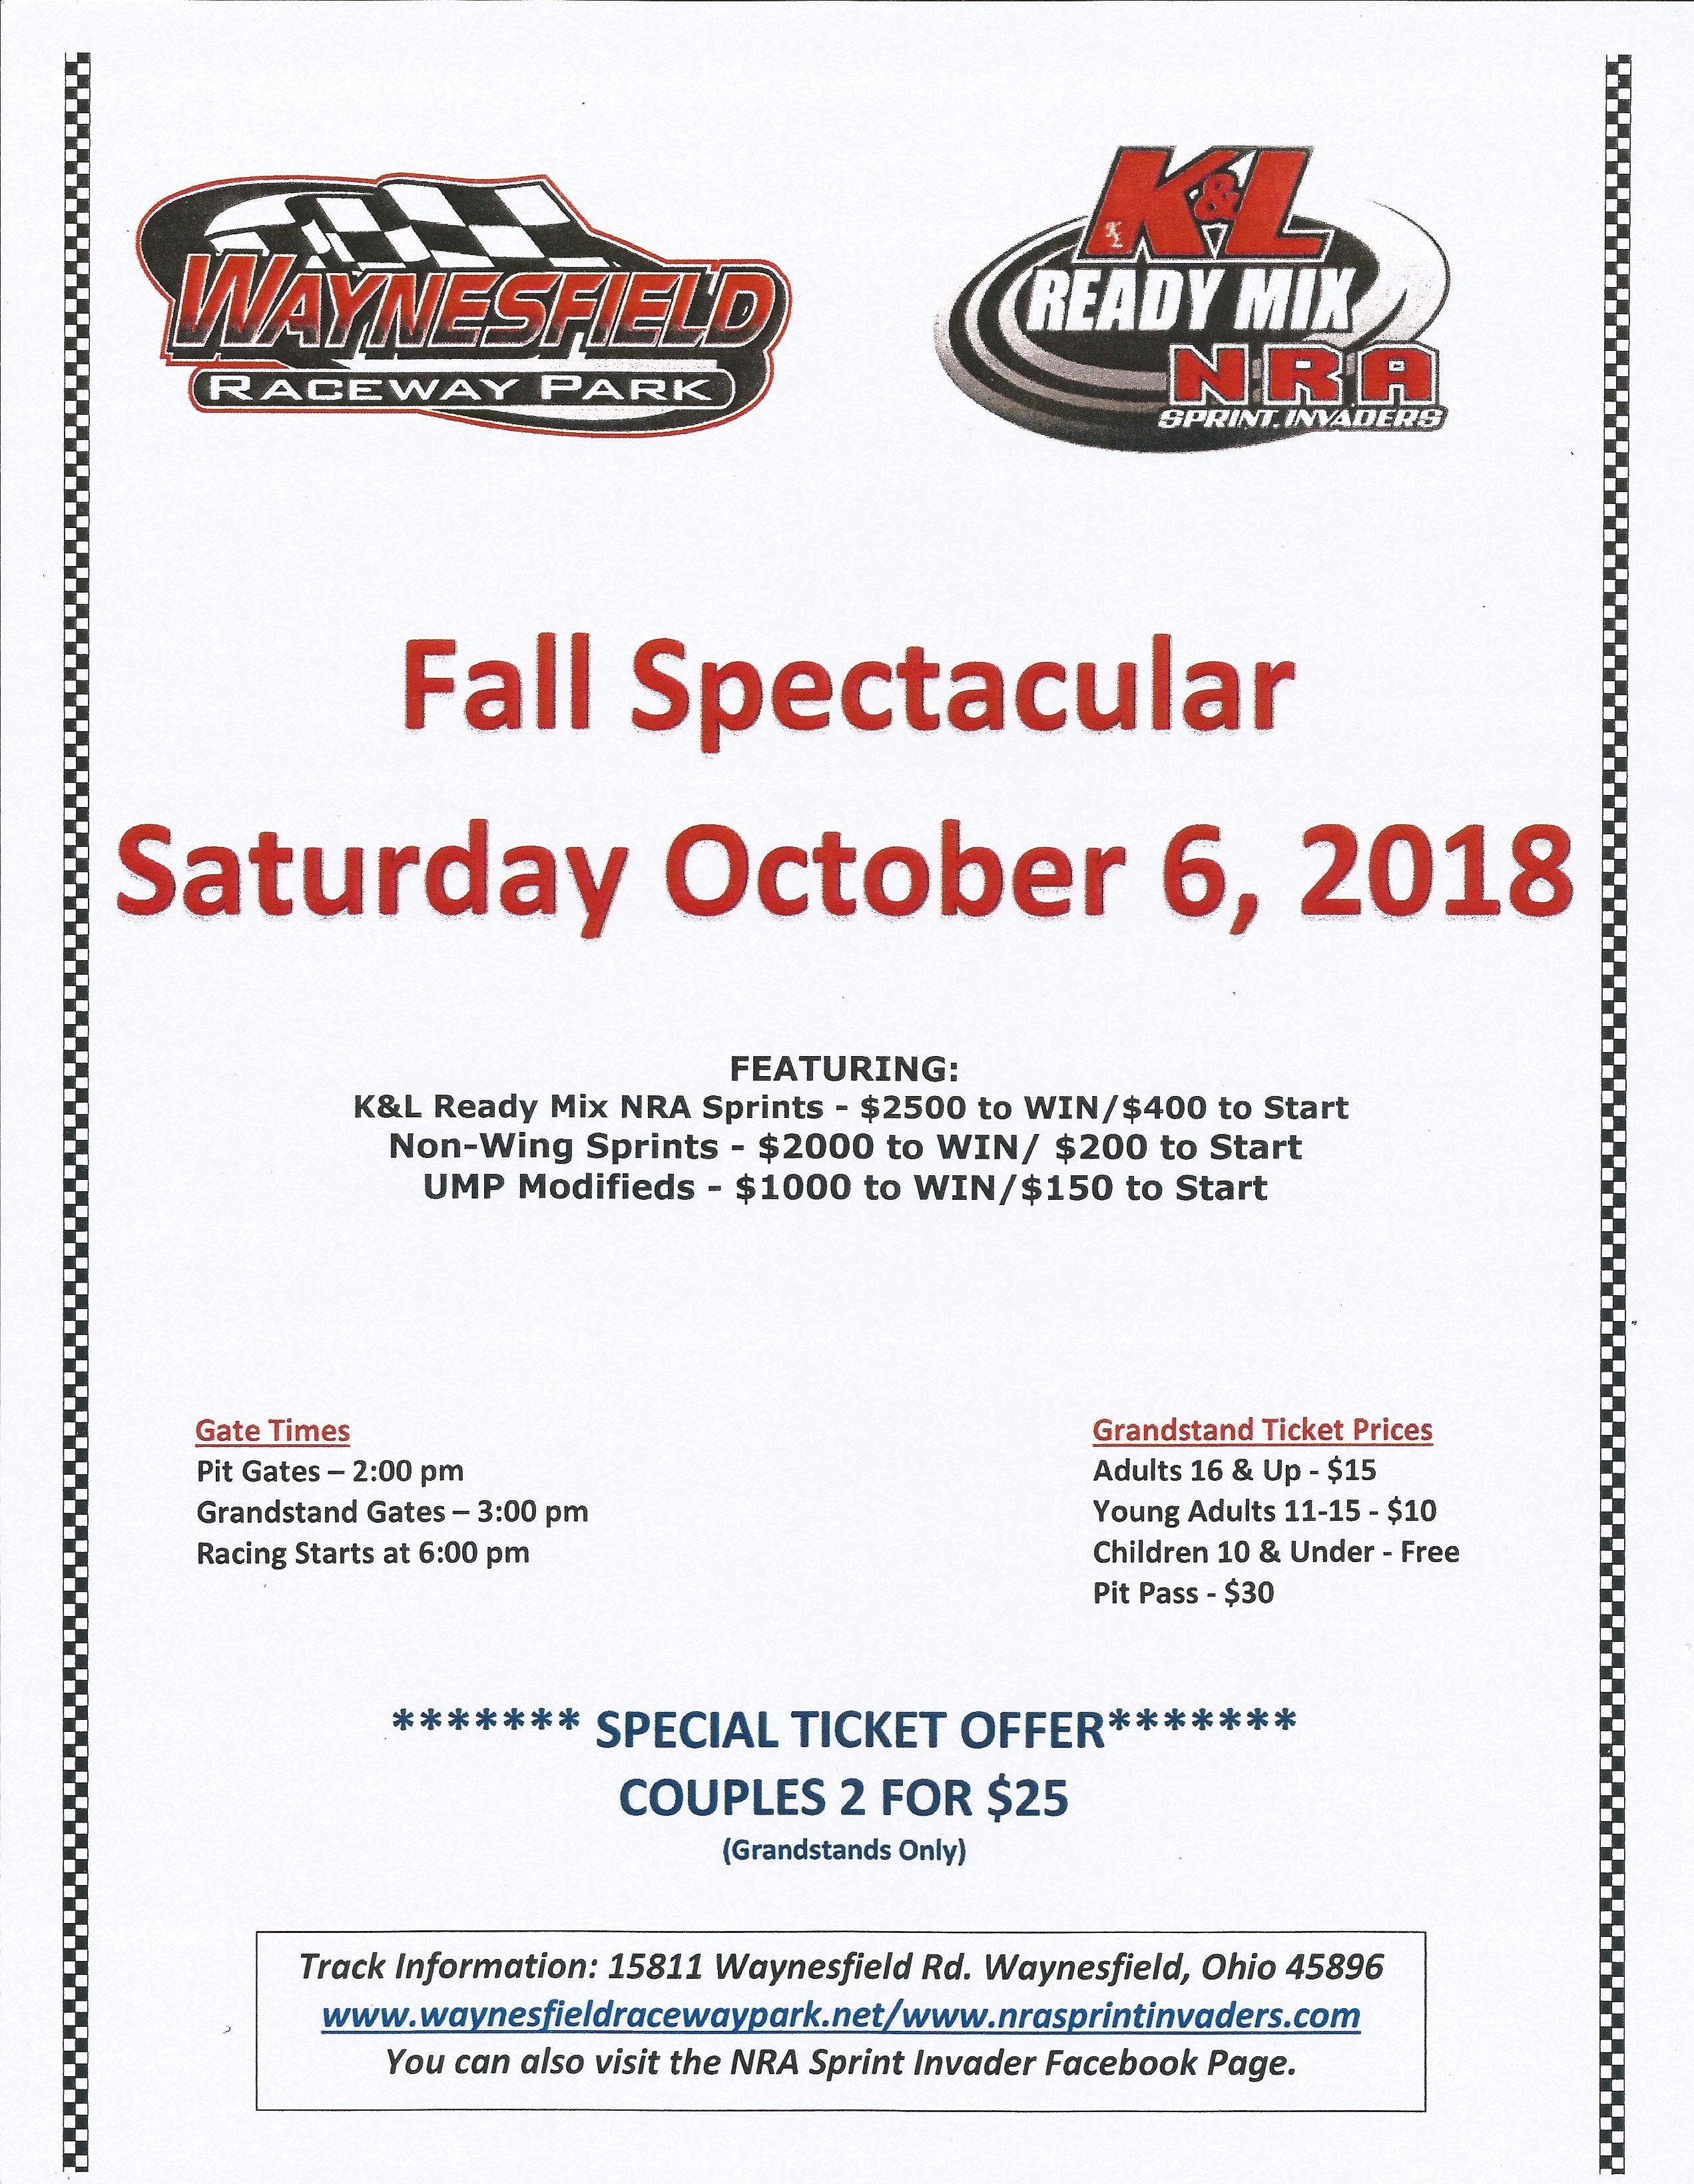 2018 Waynesfield Fall Spectacular flier